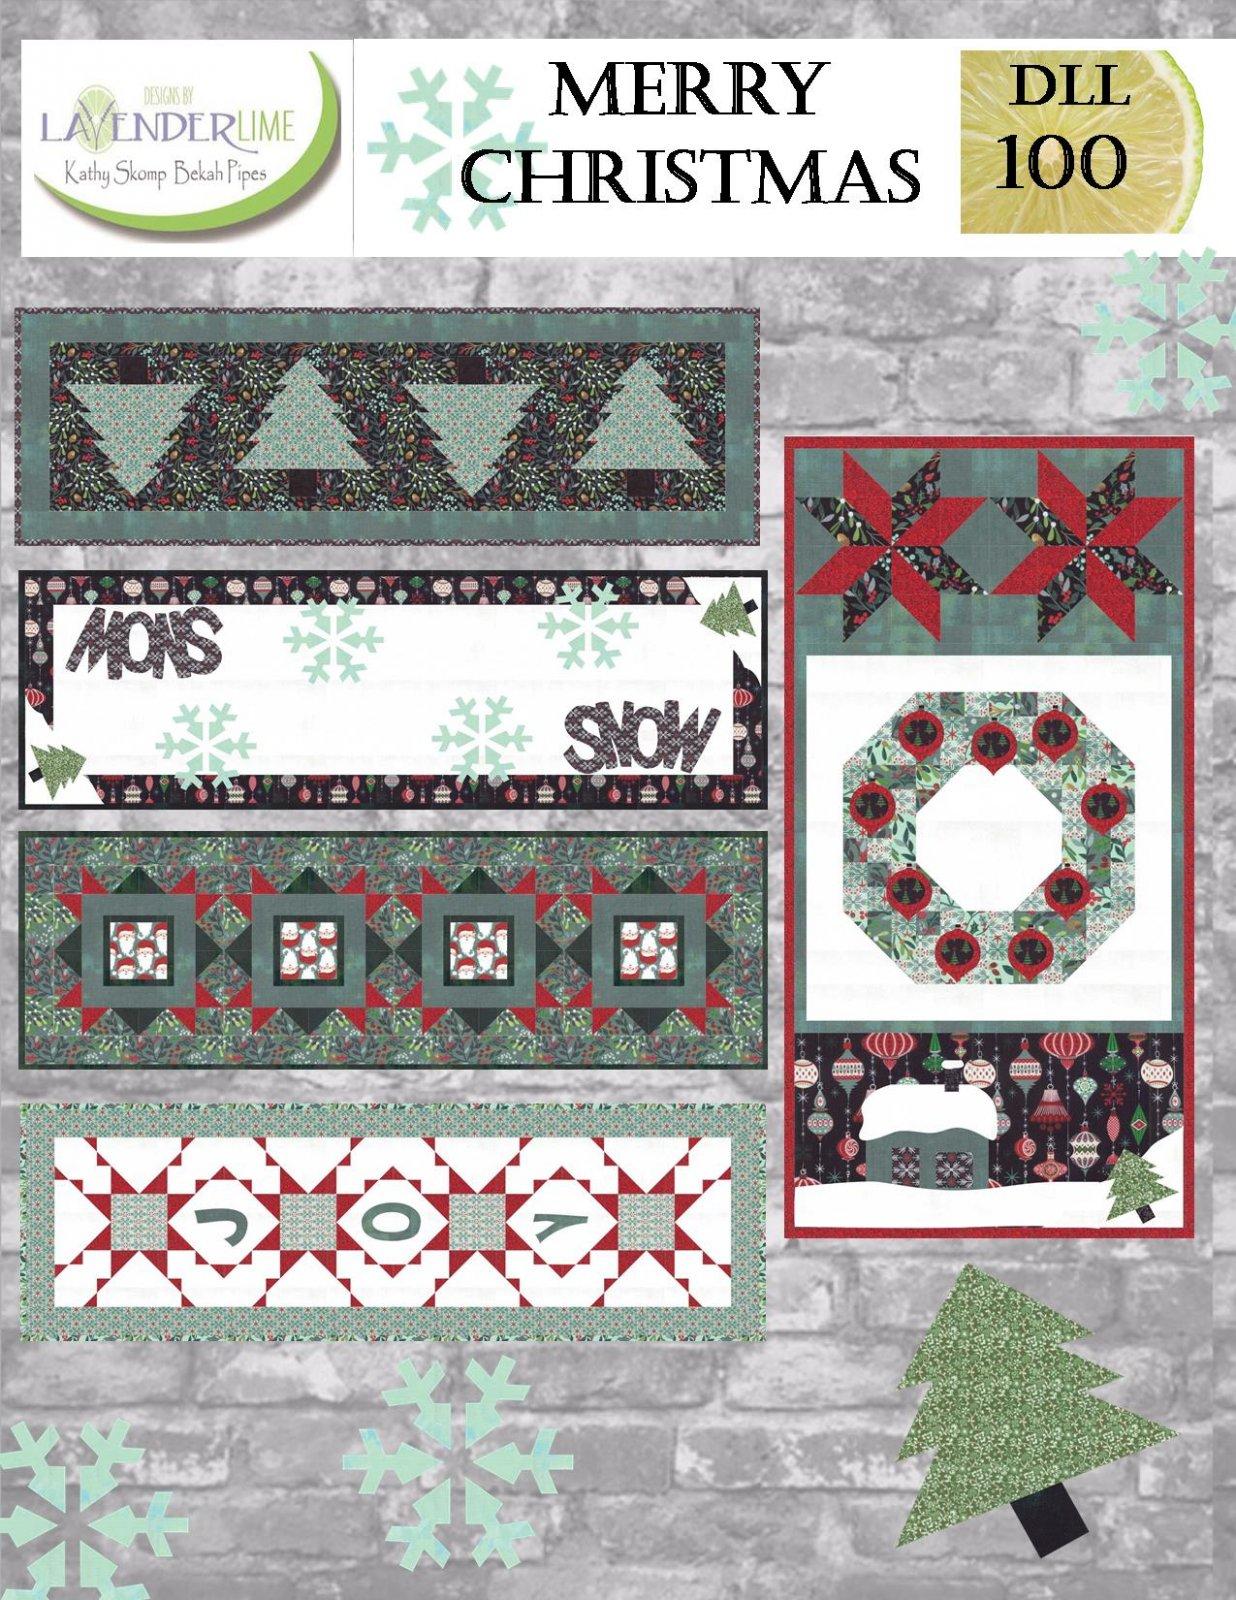 Merry Christmas PDF Download